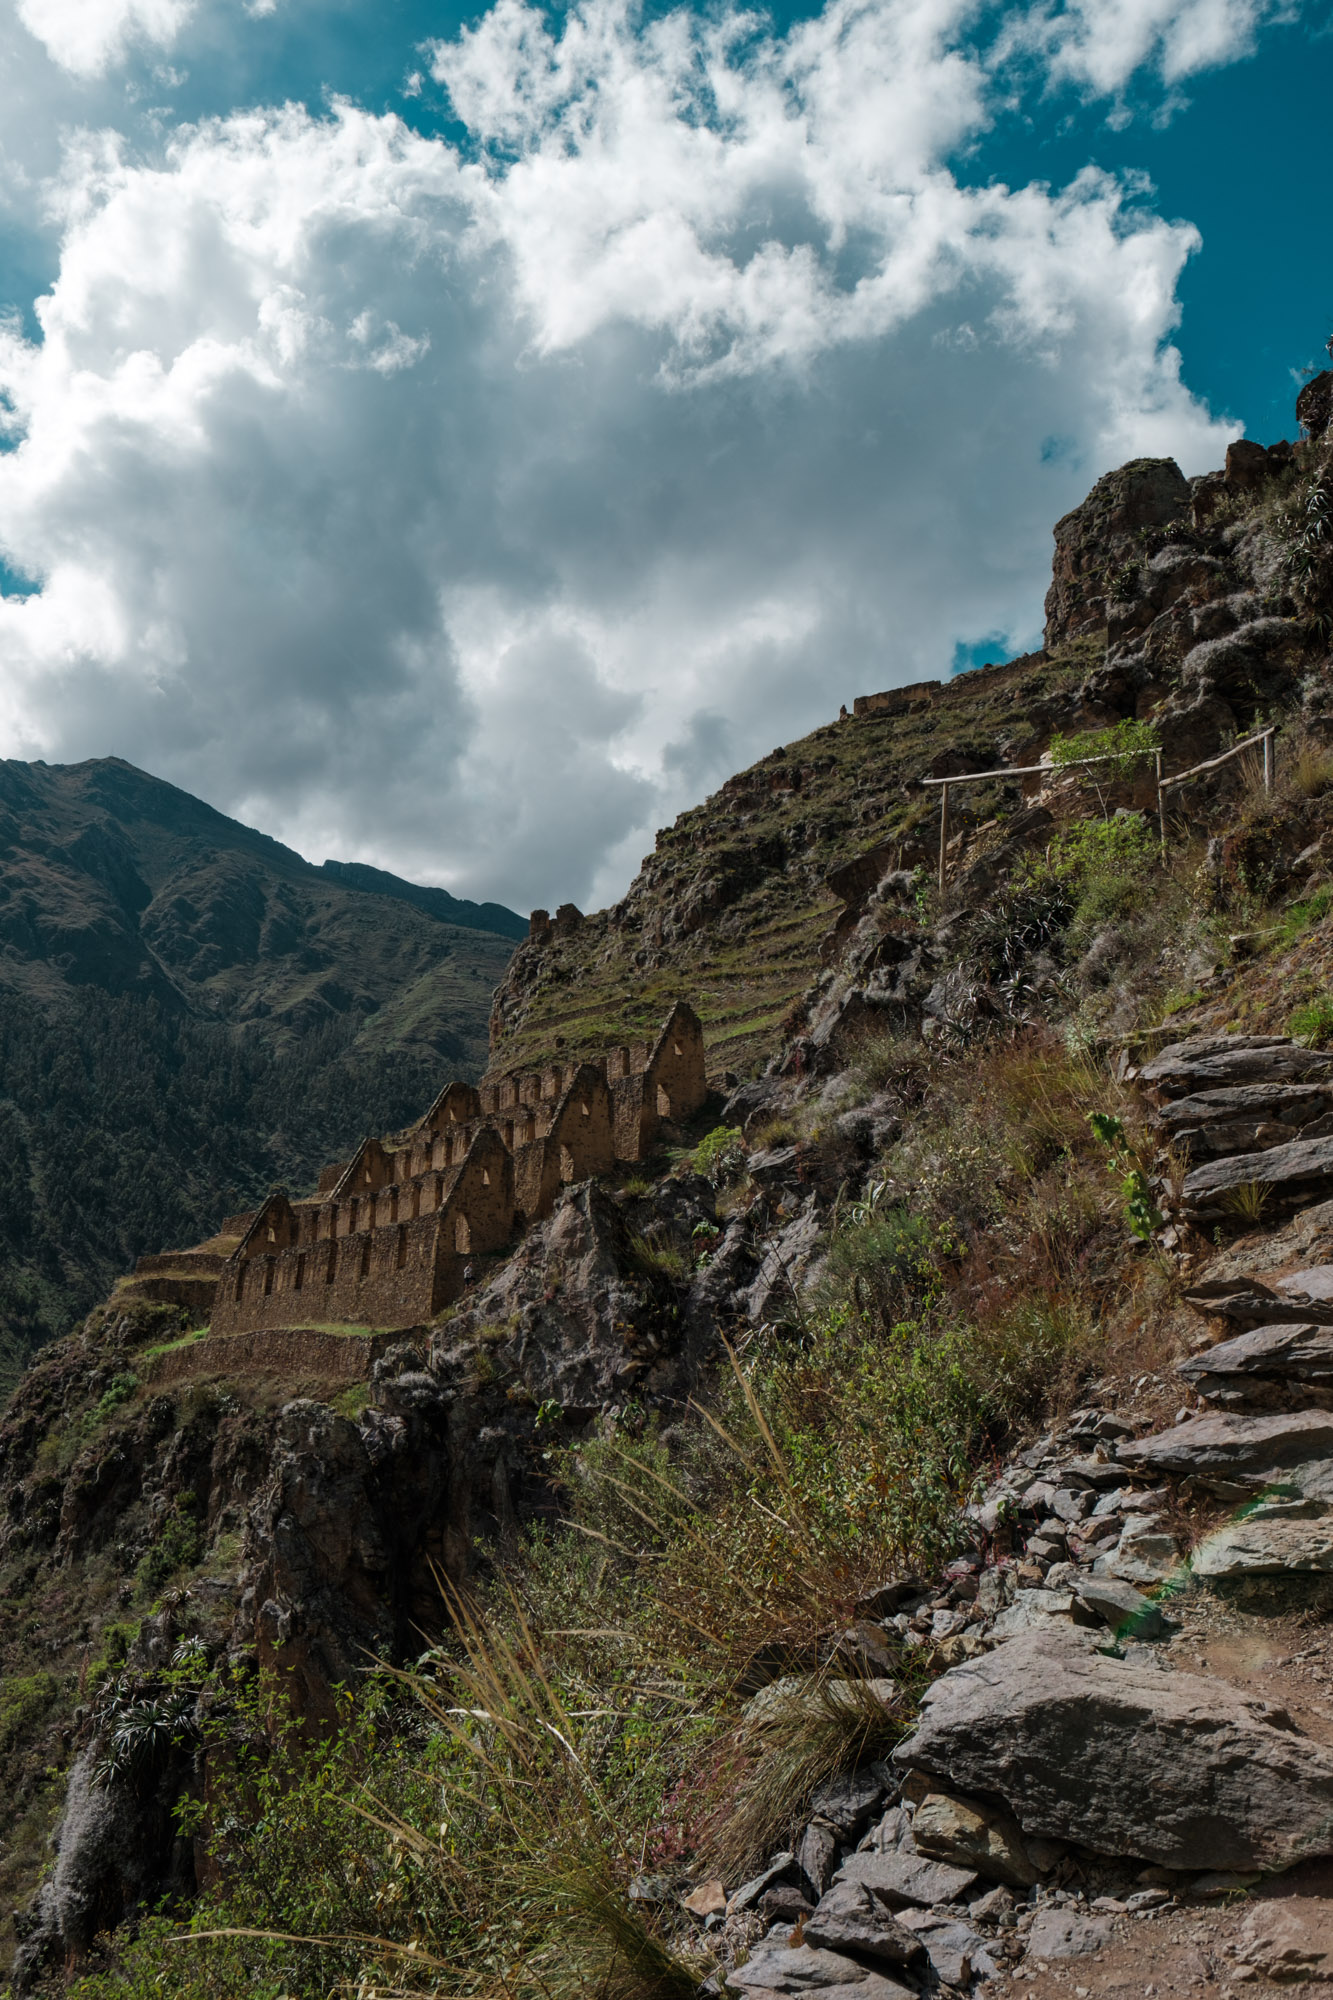 Hiking in Ollantaytambo, Peru. Fuji X-pro2, Fuji XF 16mm f/1.4 WR.